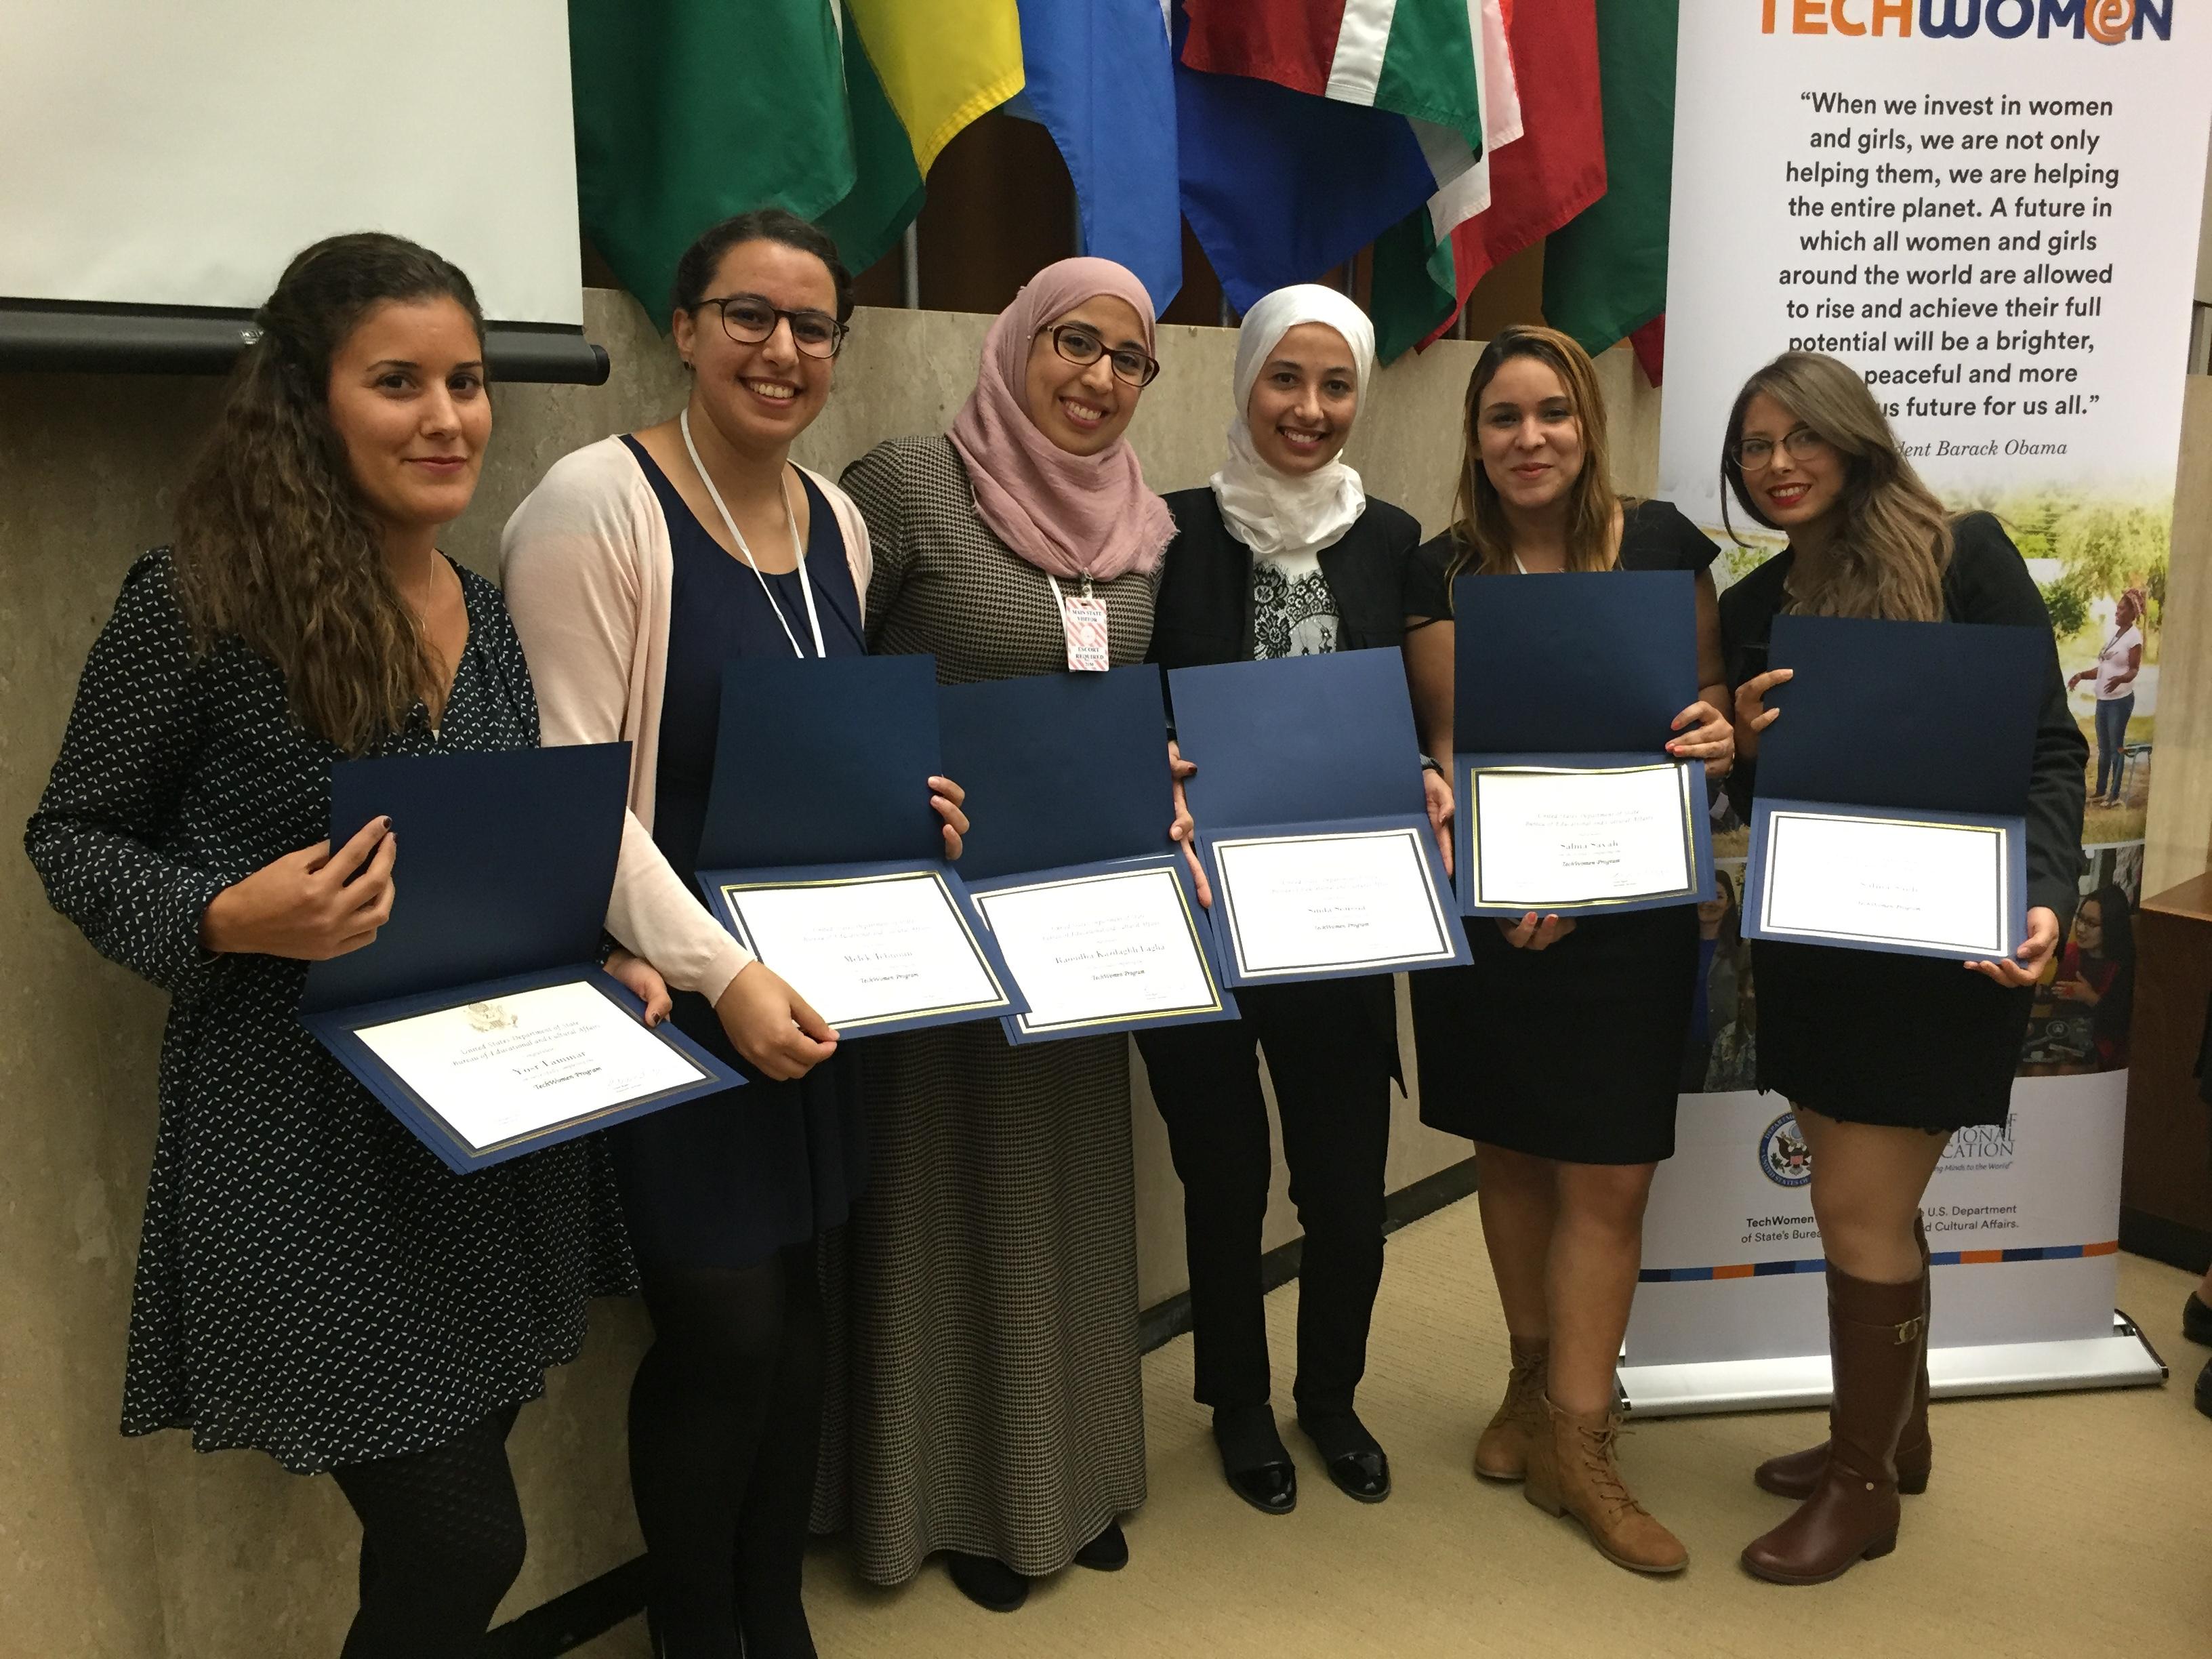 TechWomen Team Tunisia WAKTECH Washington DC, 14 October 2016